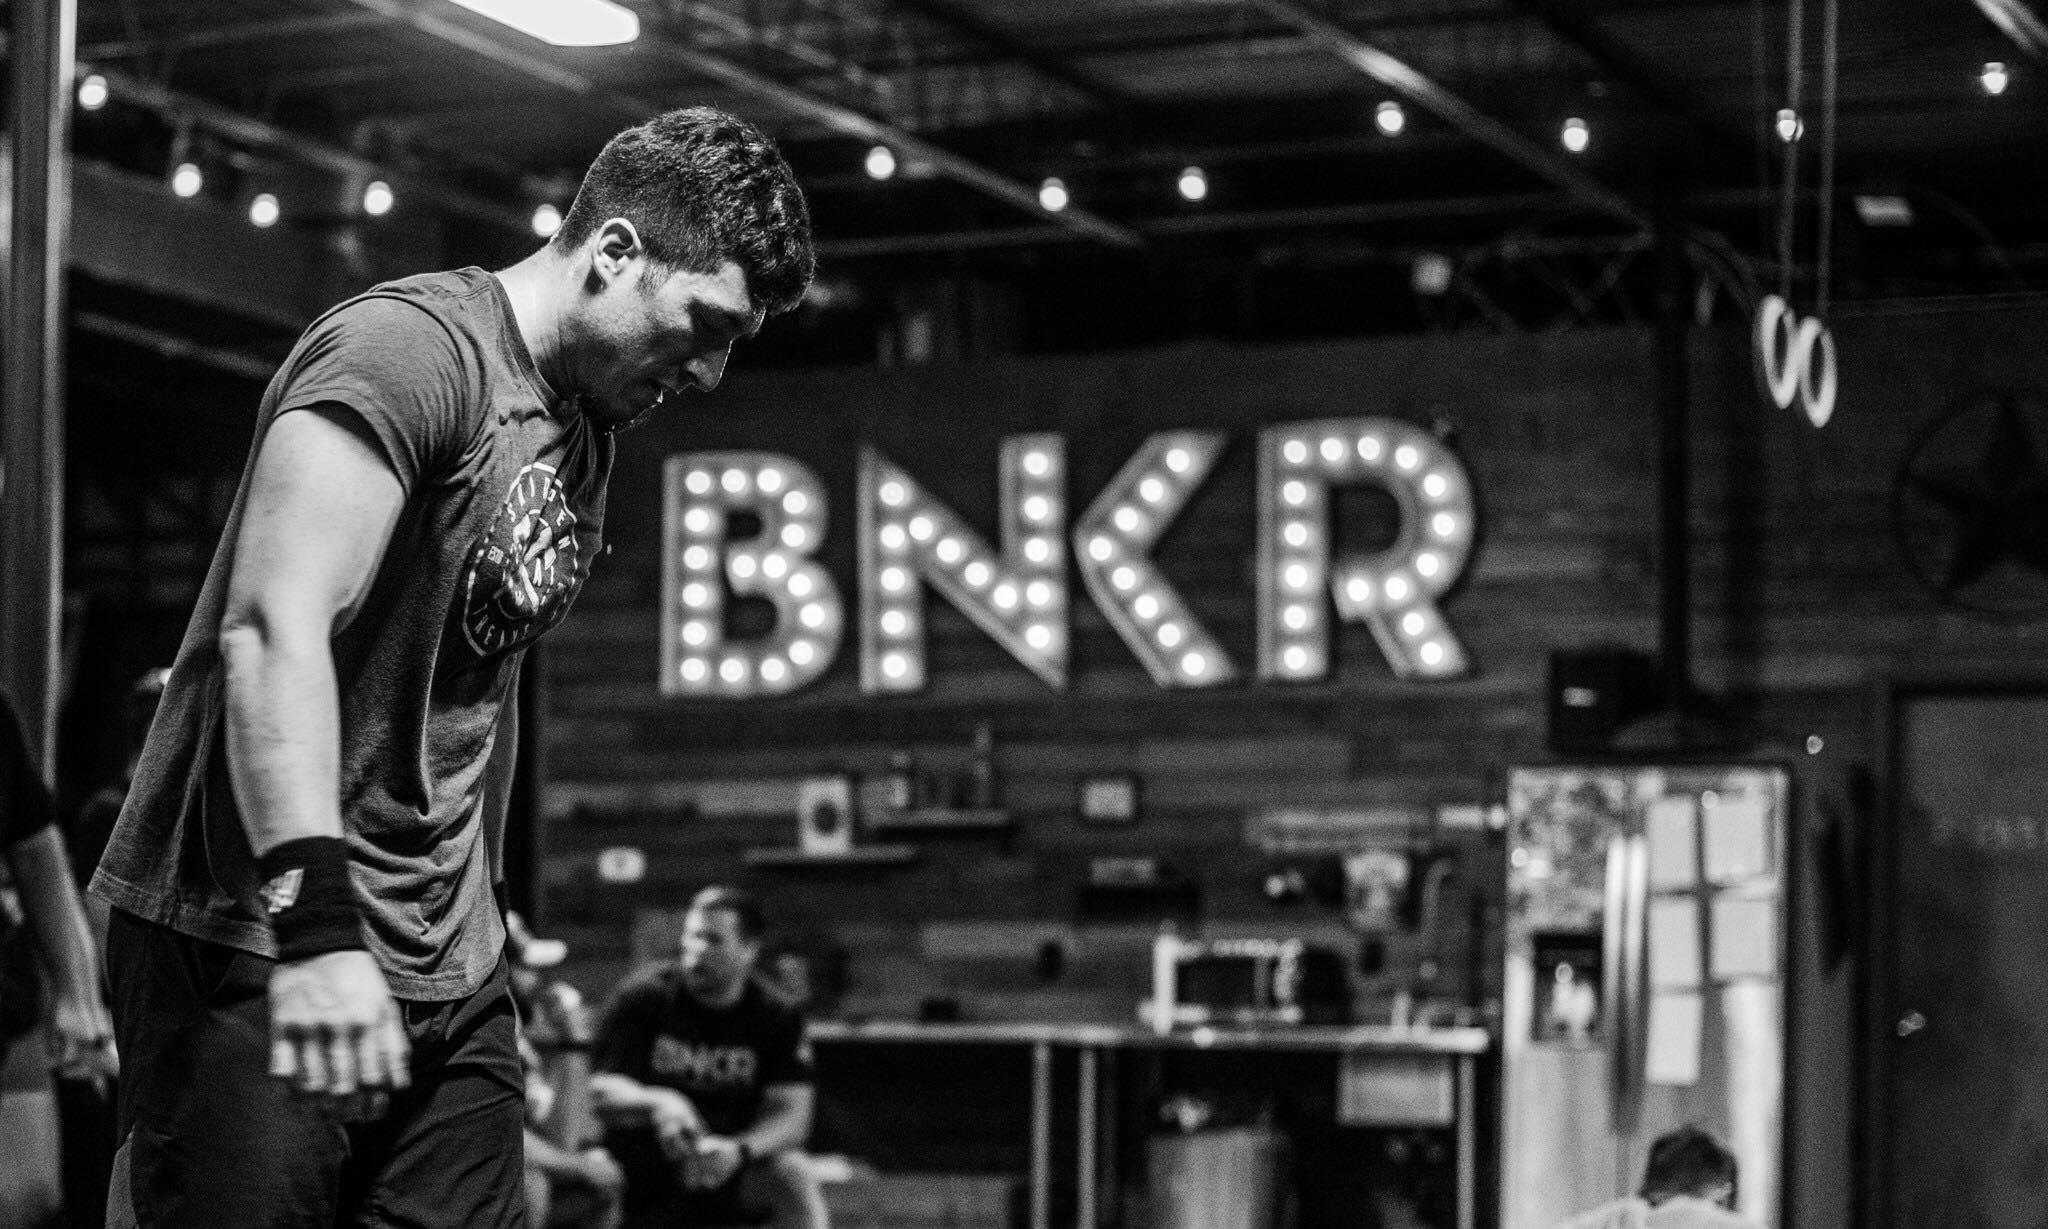 CrossFit BNKR Richmond image 4